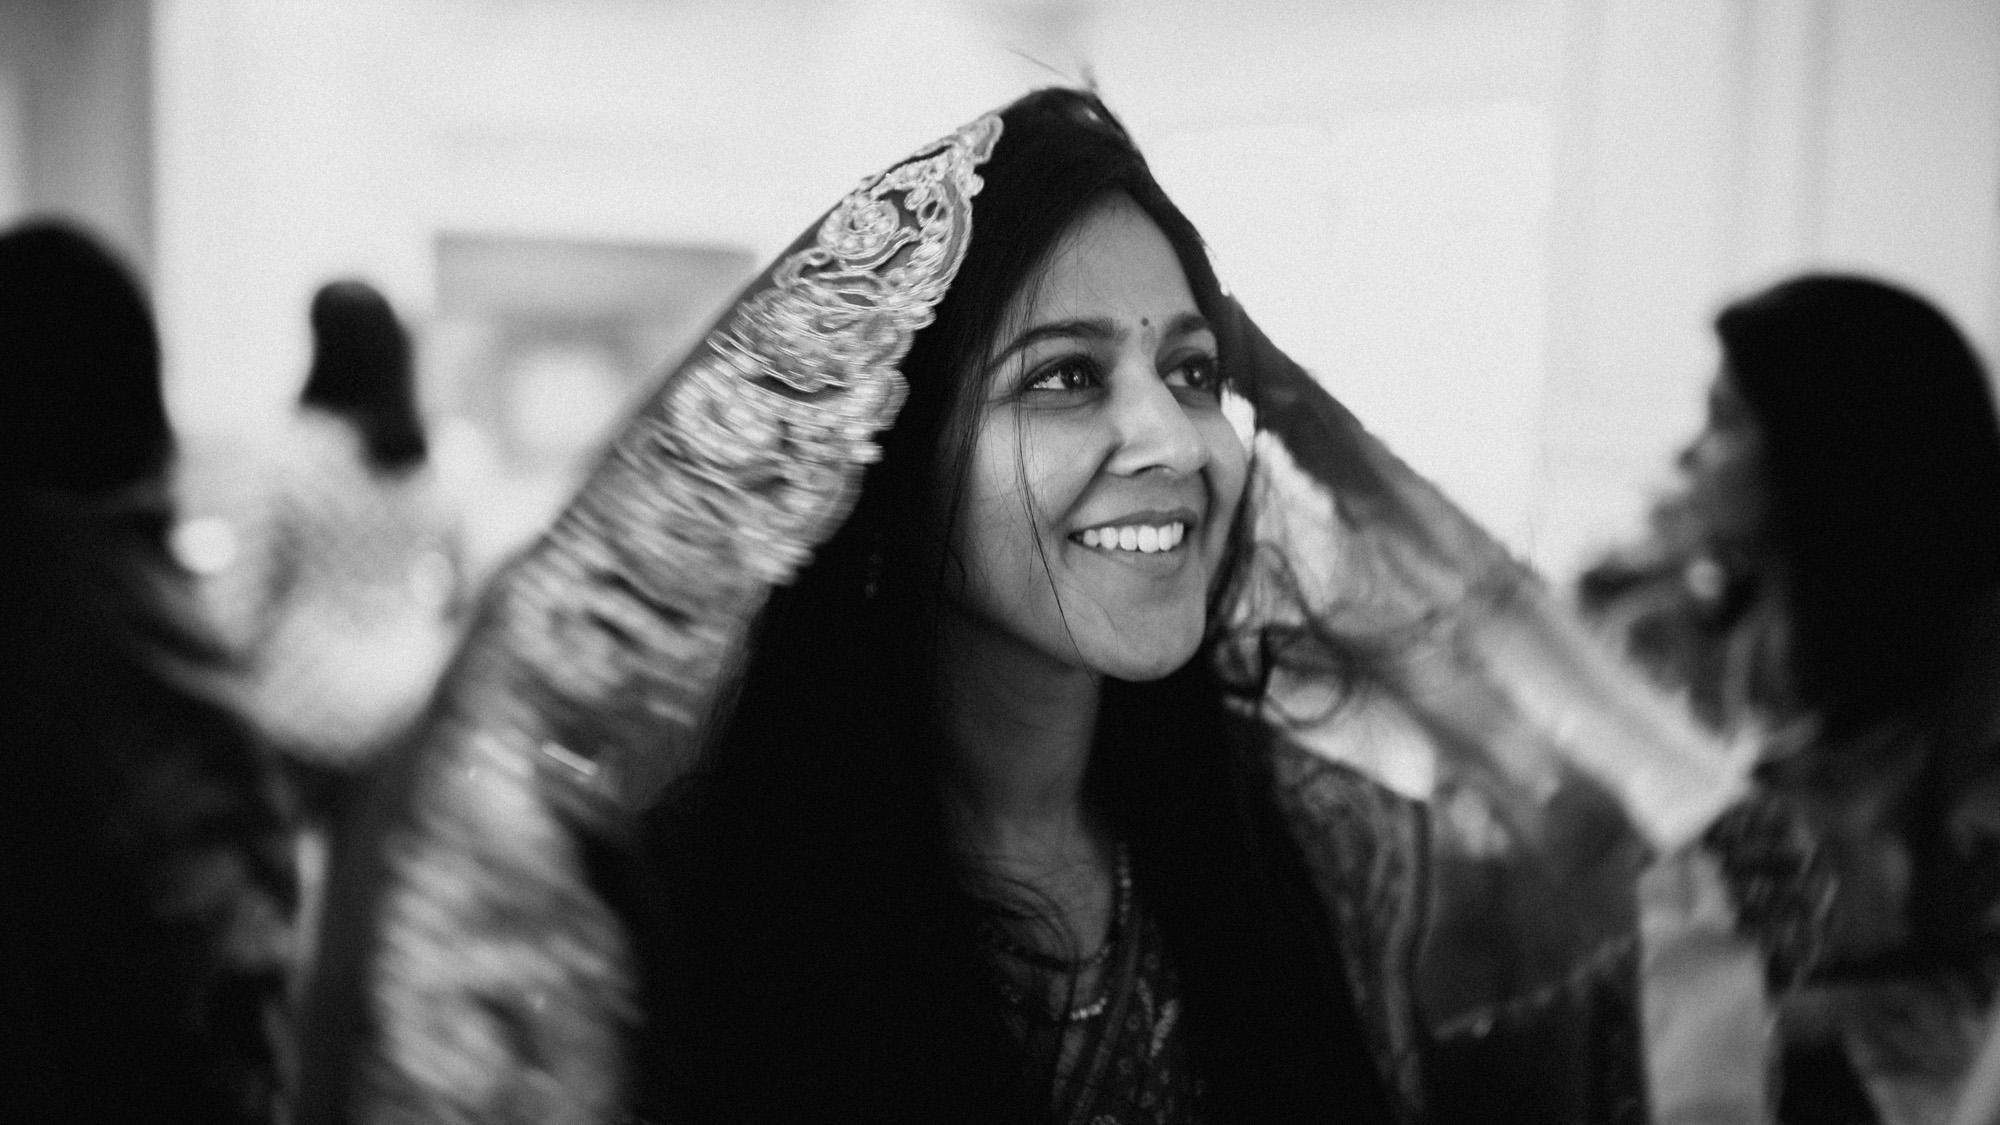 anu_maneesh_alec_vanderboom_Indian_wedding_photography-0195.jpg